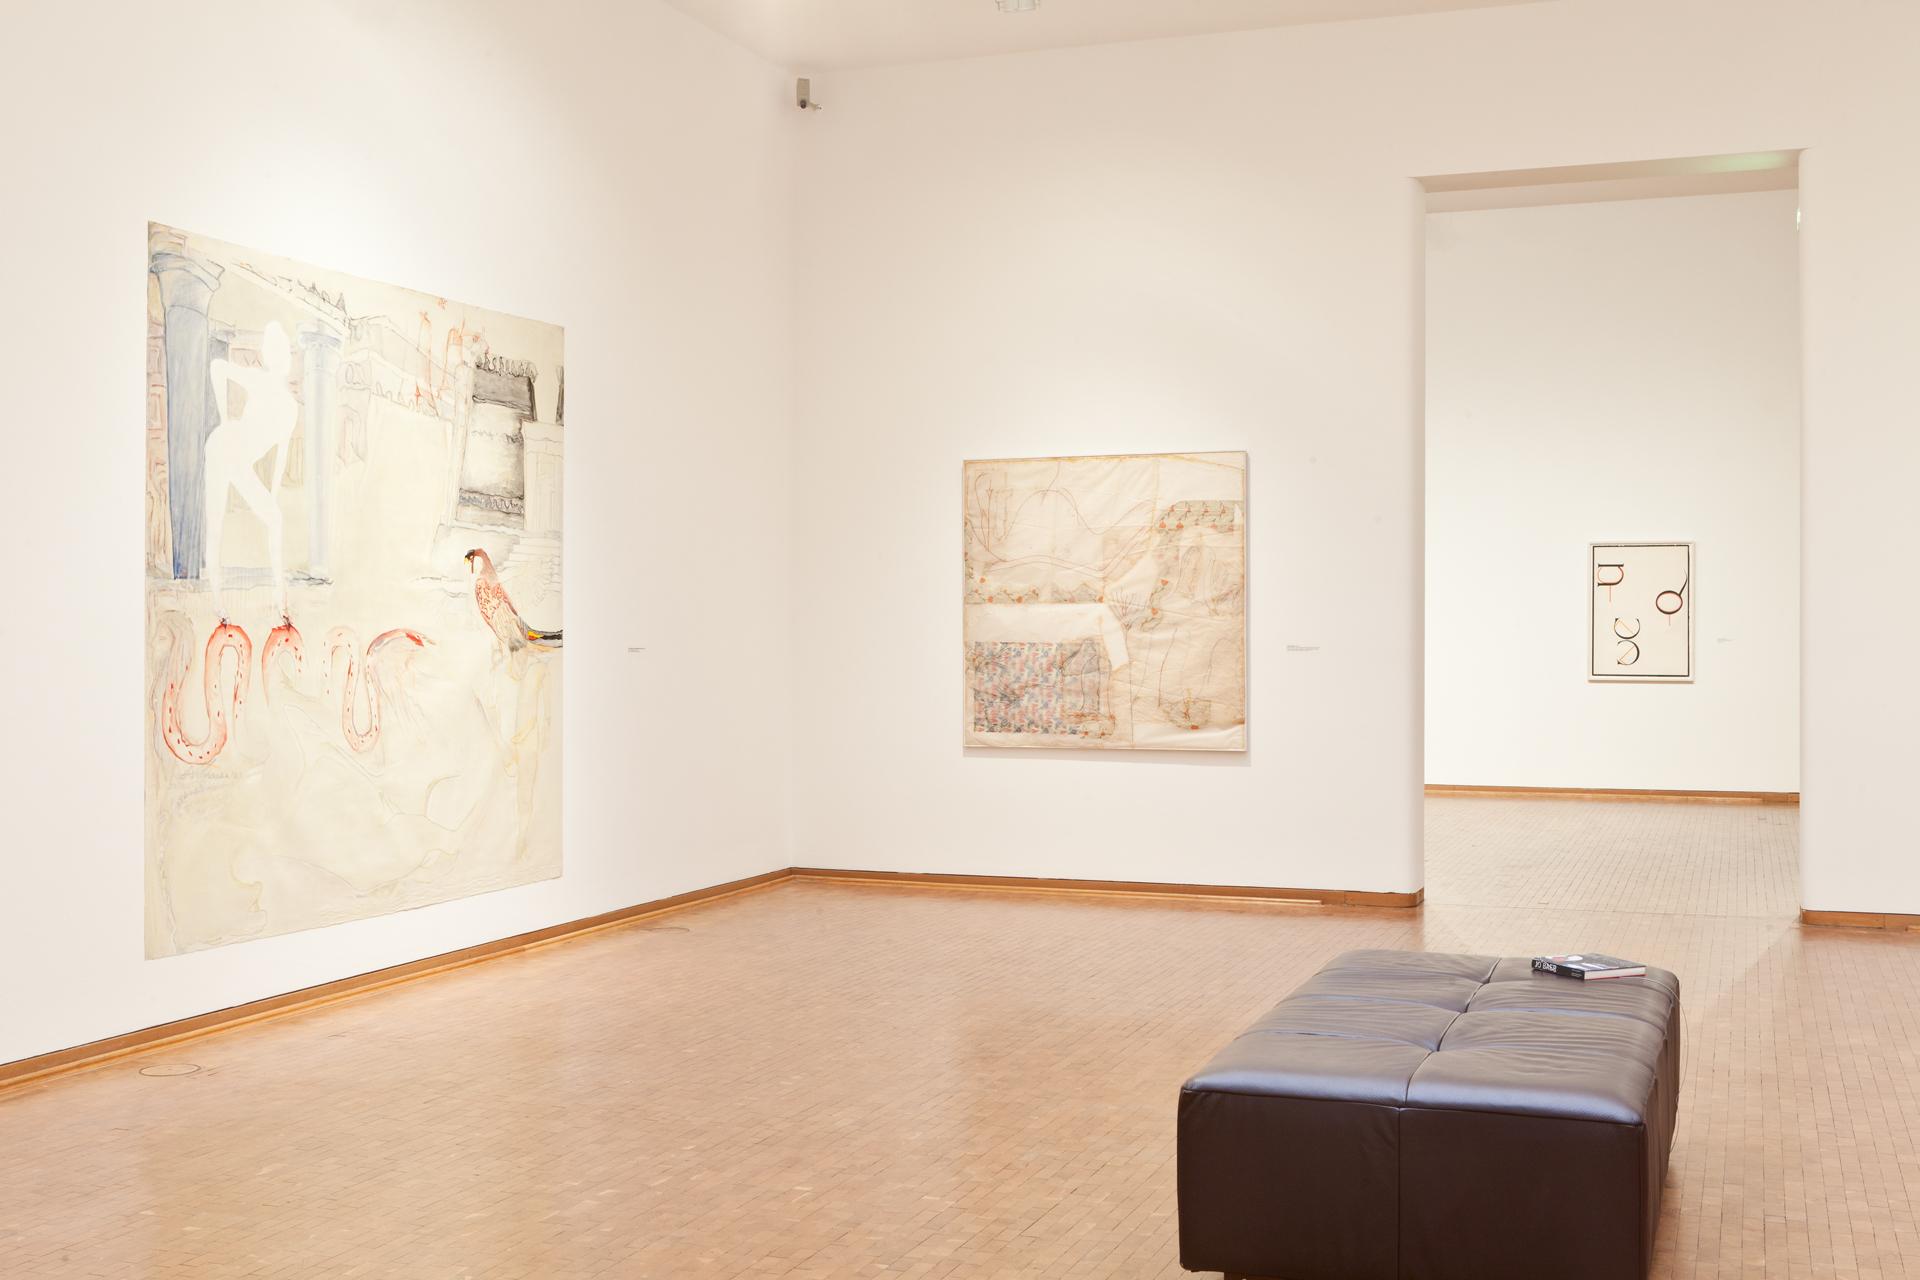 Galerie Barbara Thumm \ Jo Baer